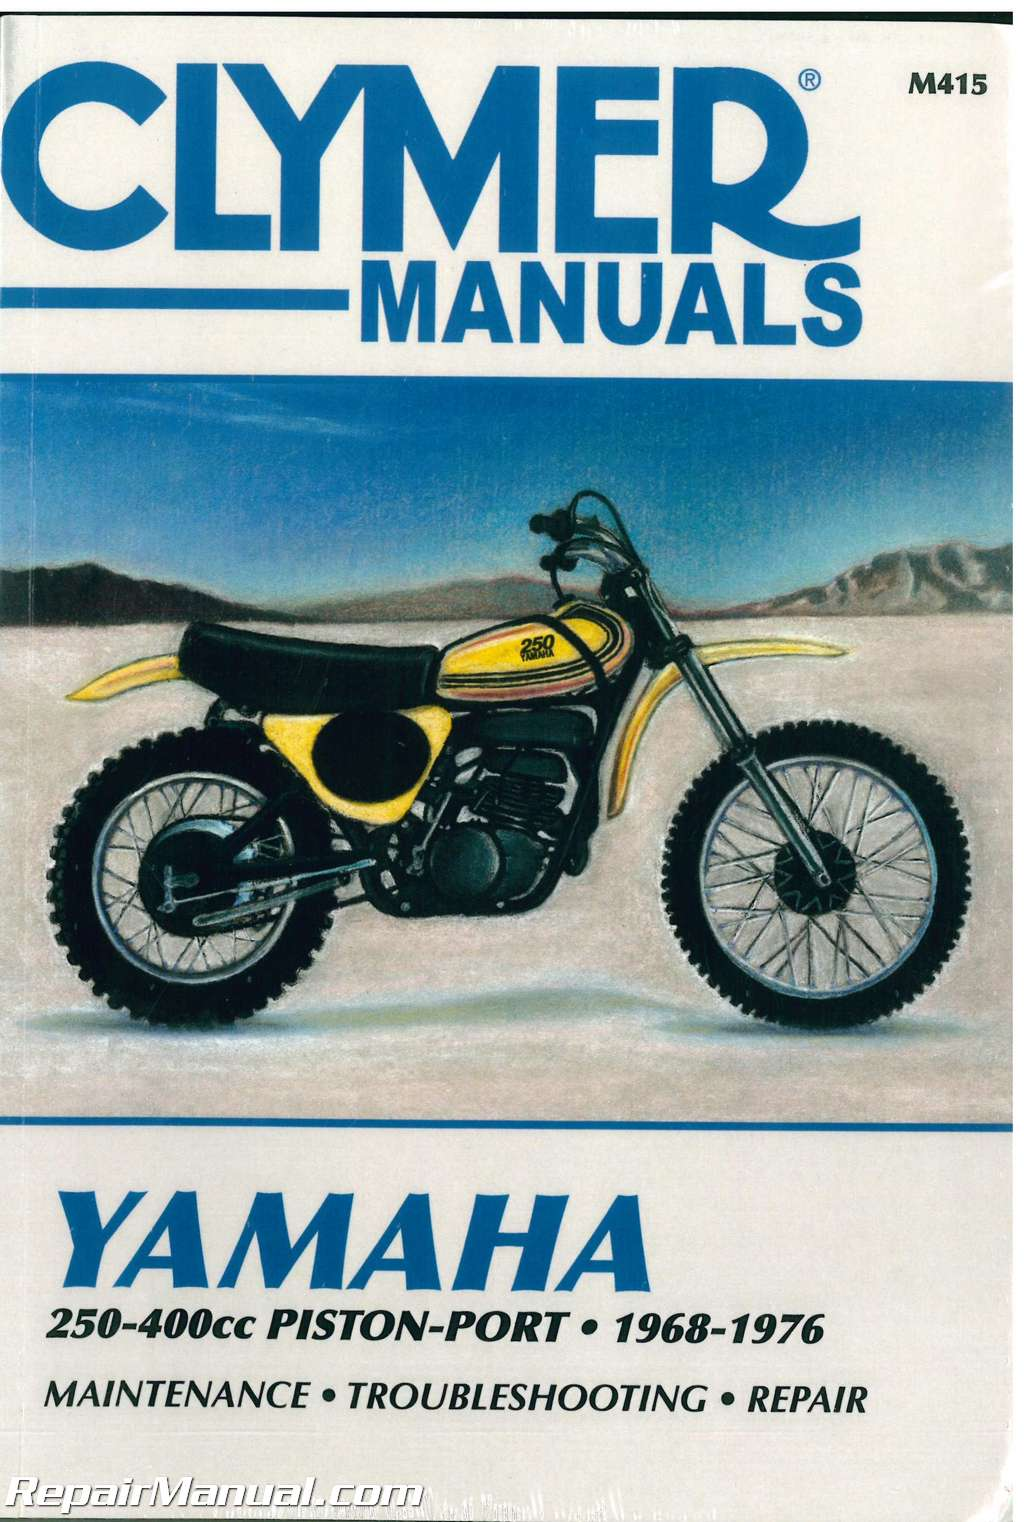 1968-1976 Yamaha 250-400cc Piston Port Clymer Motorcycle Repair Manual